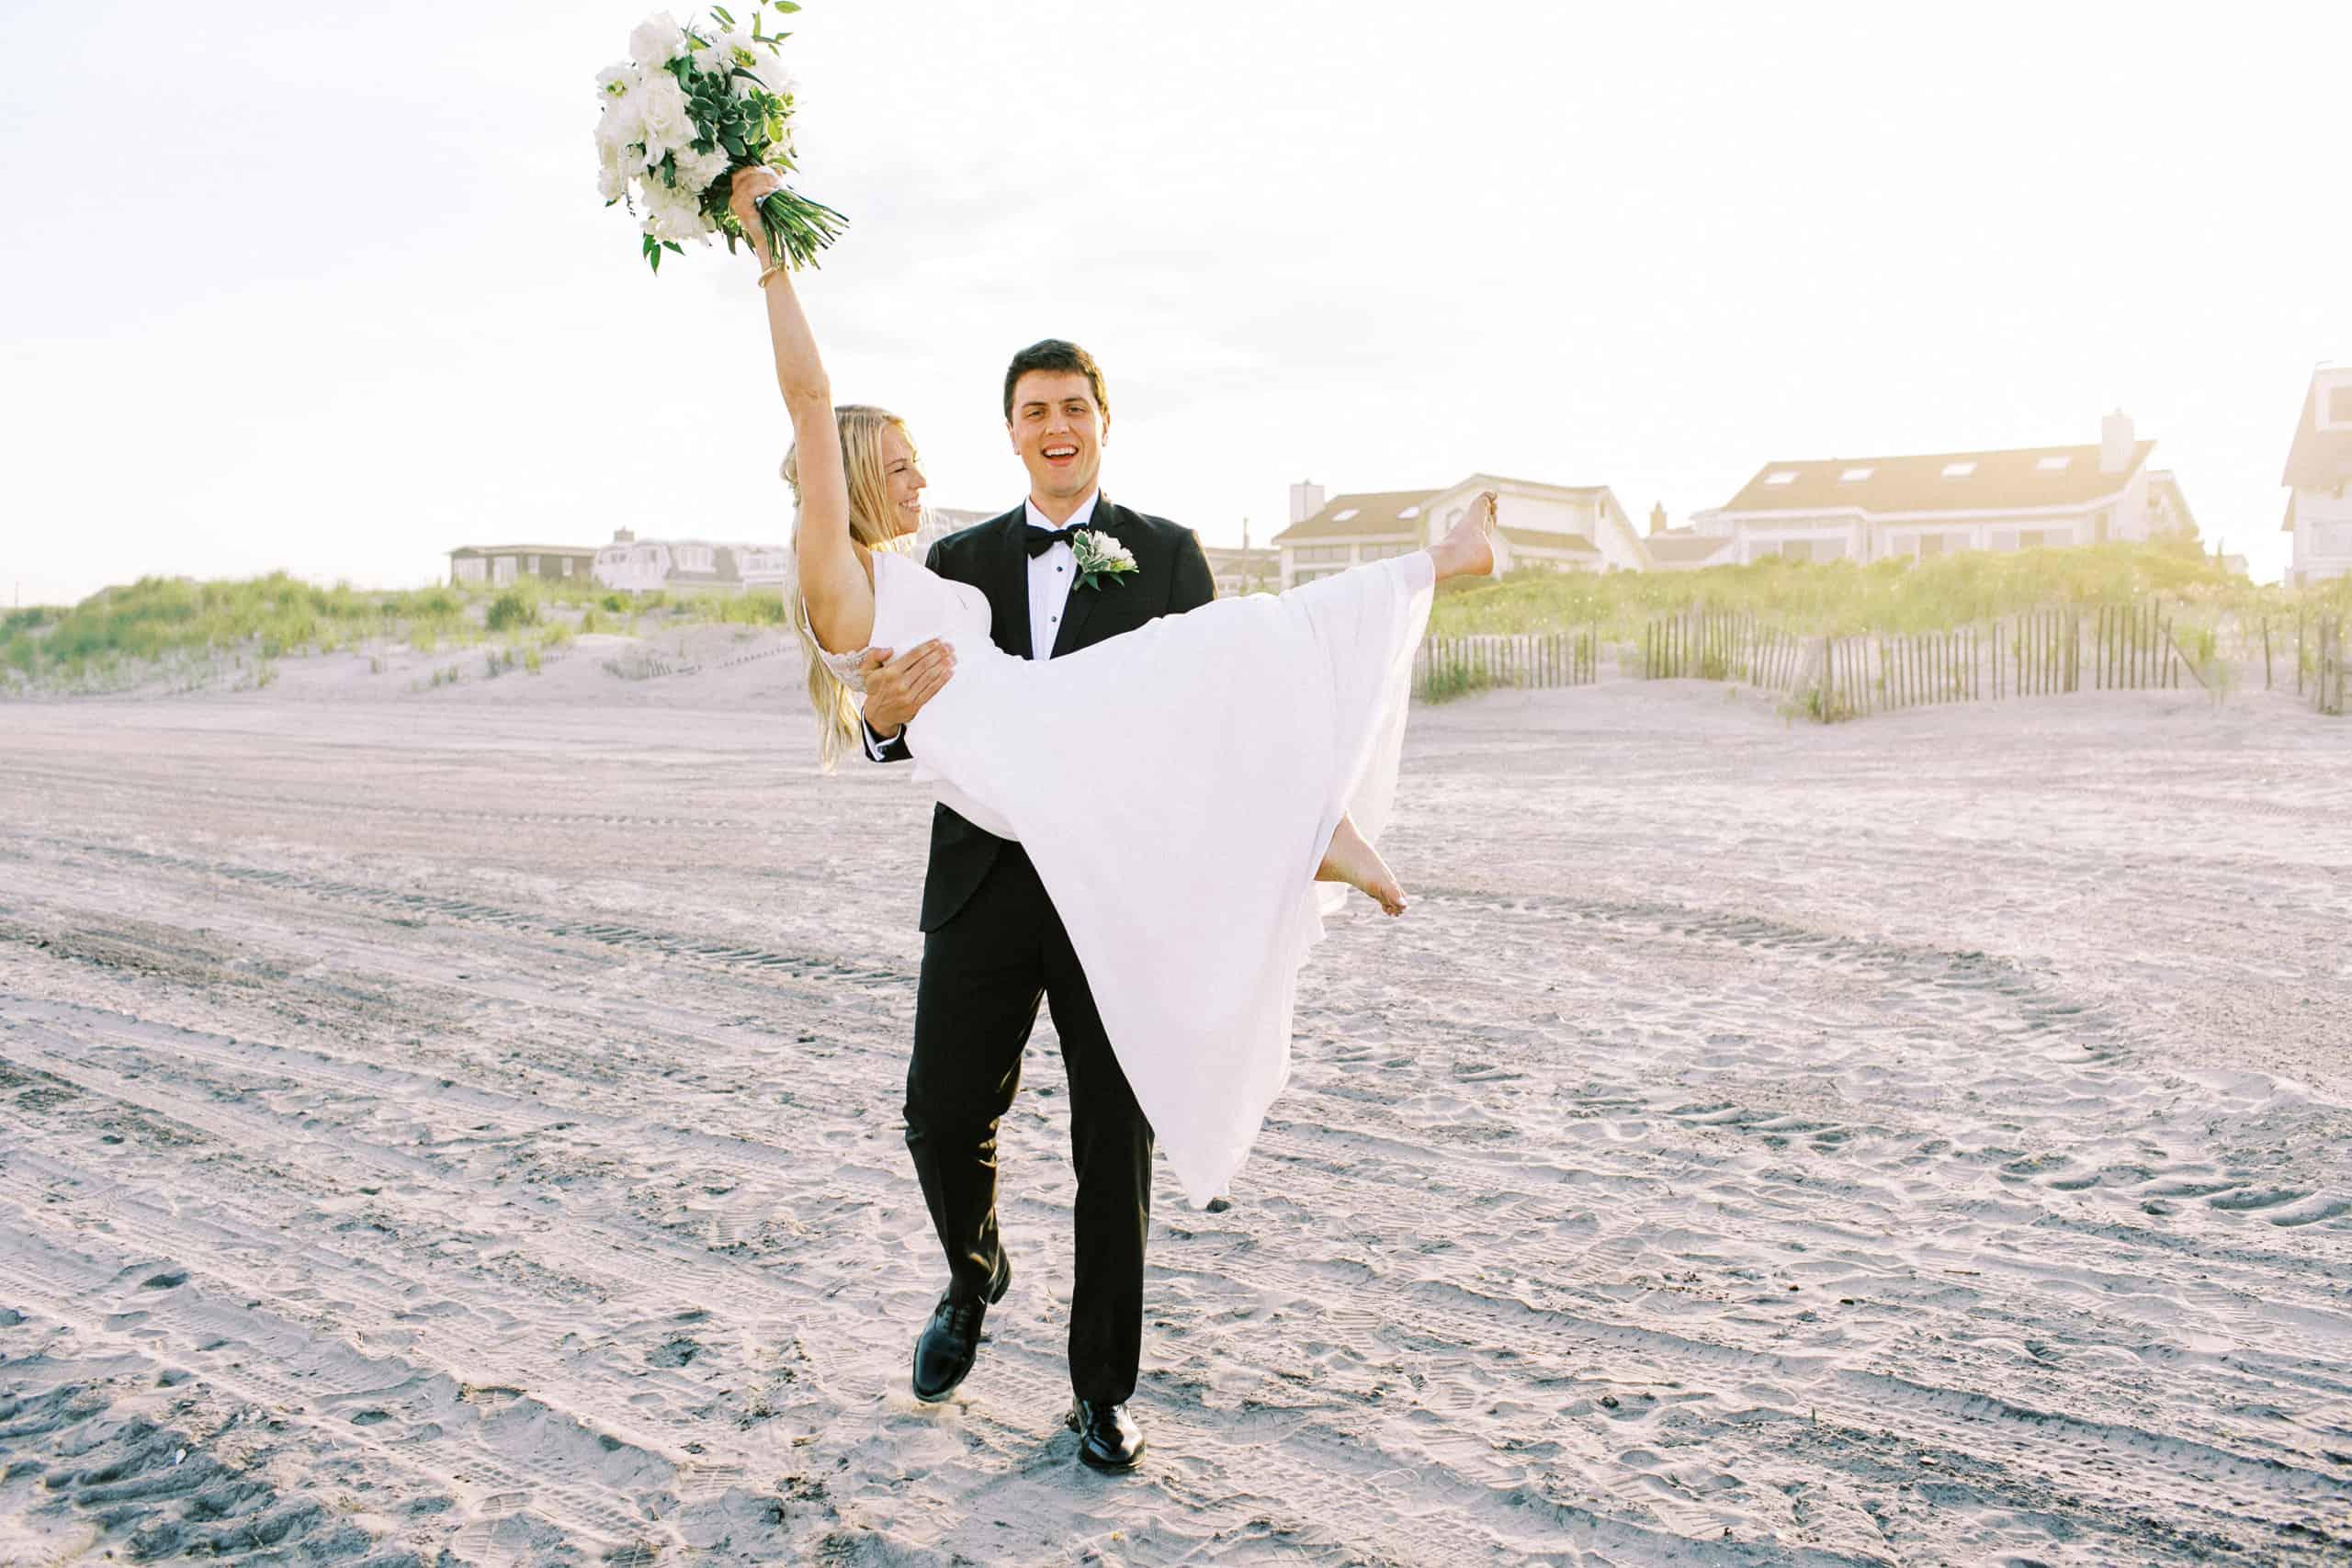 Beach wedding new jersey